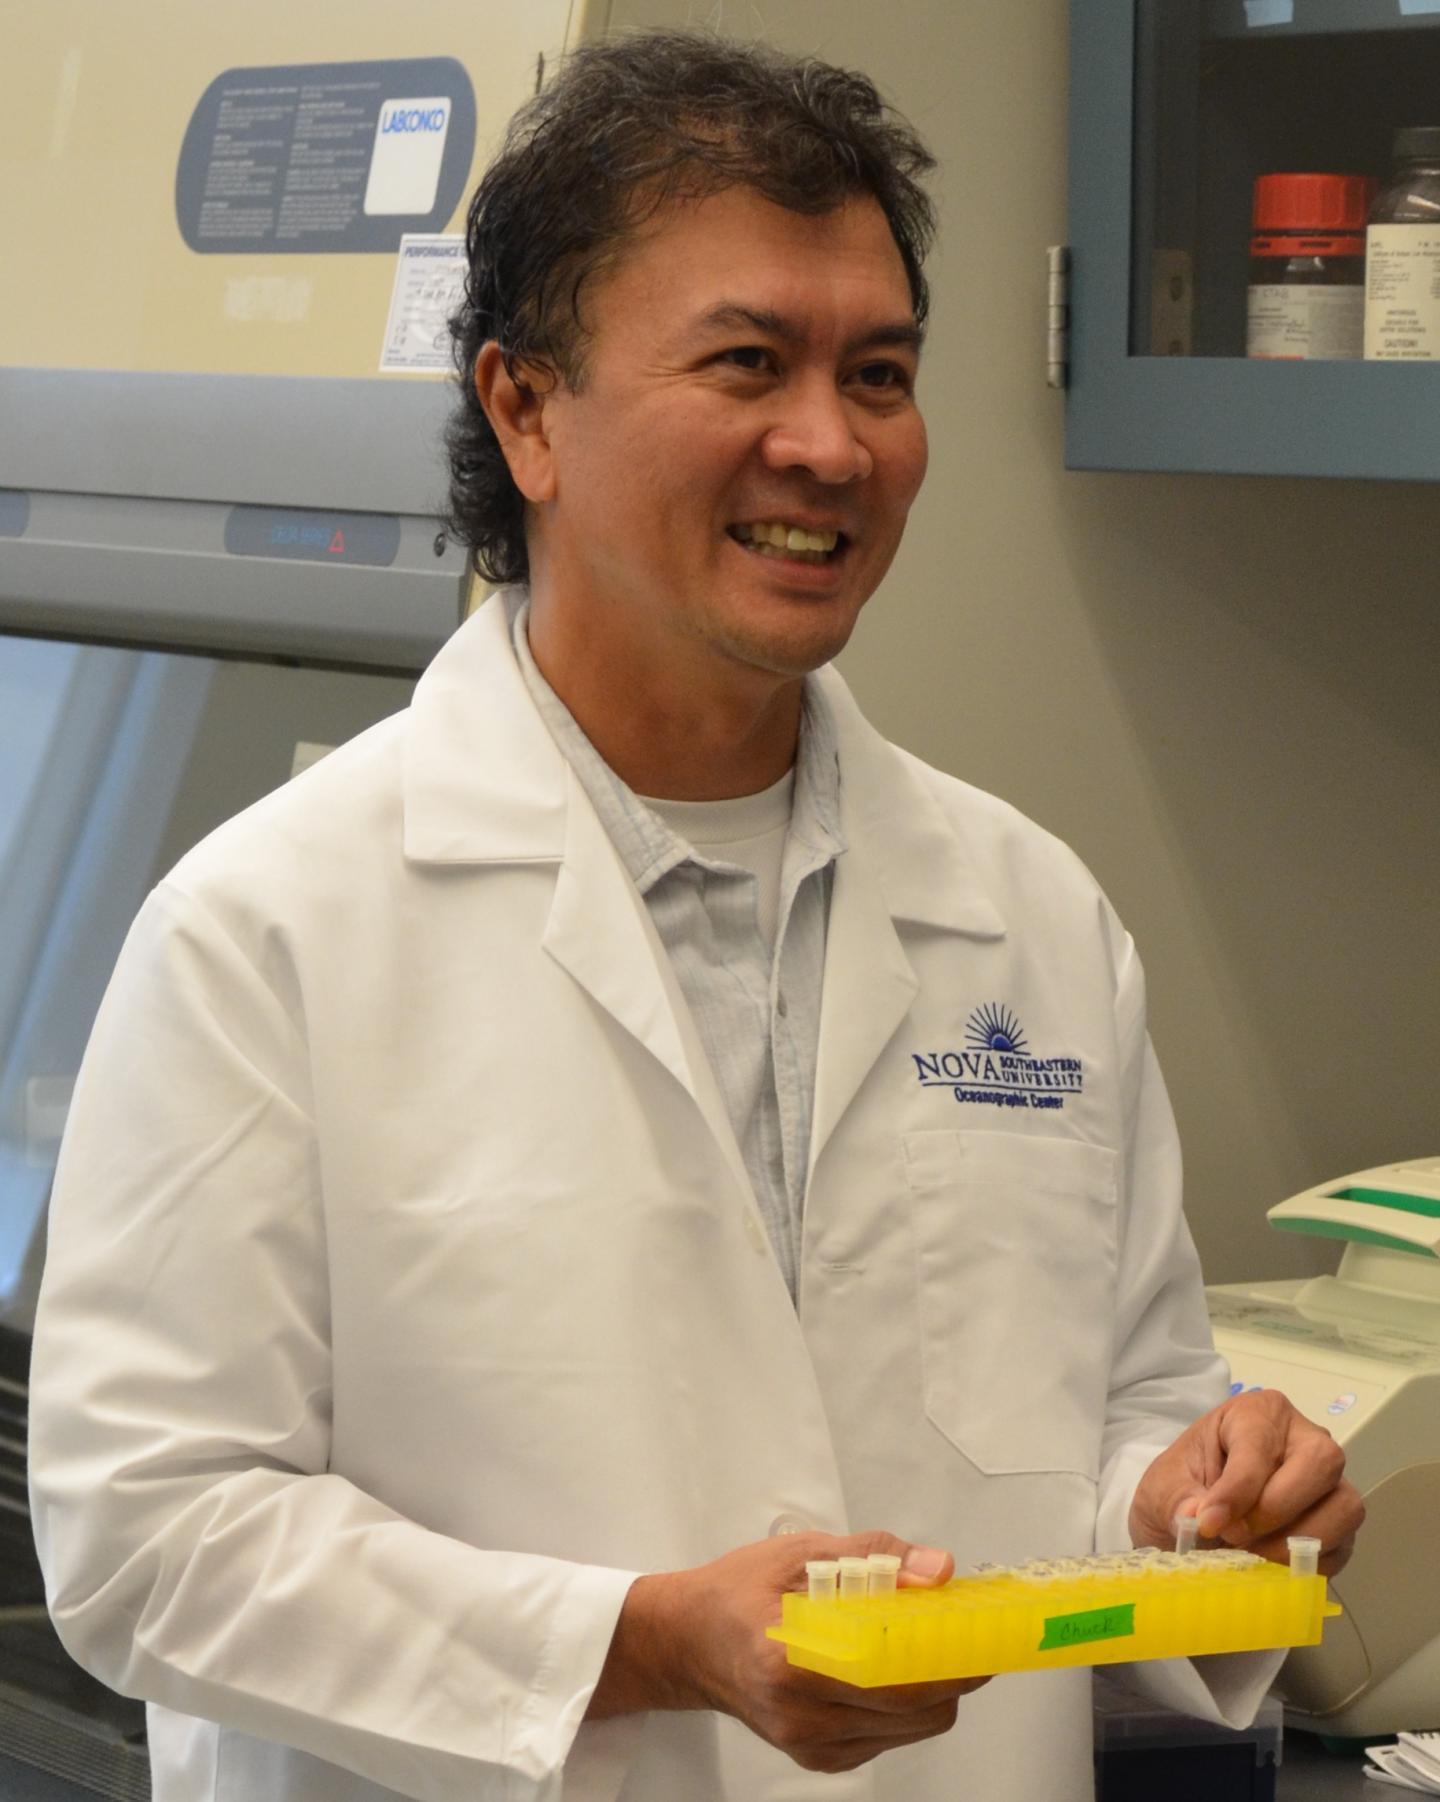 Dr. Jose Lopez, Nova Southeastern University